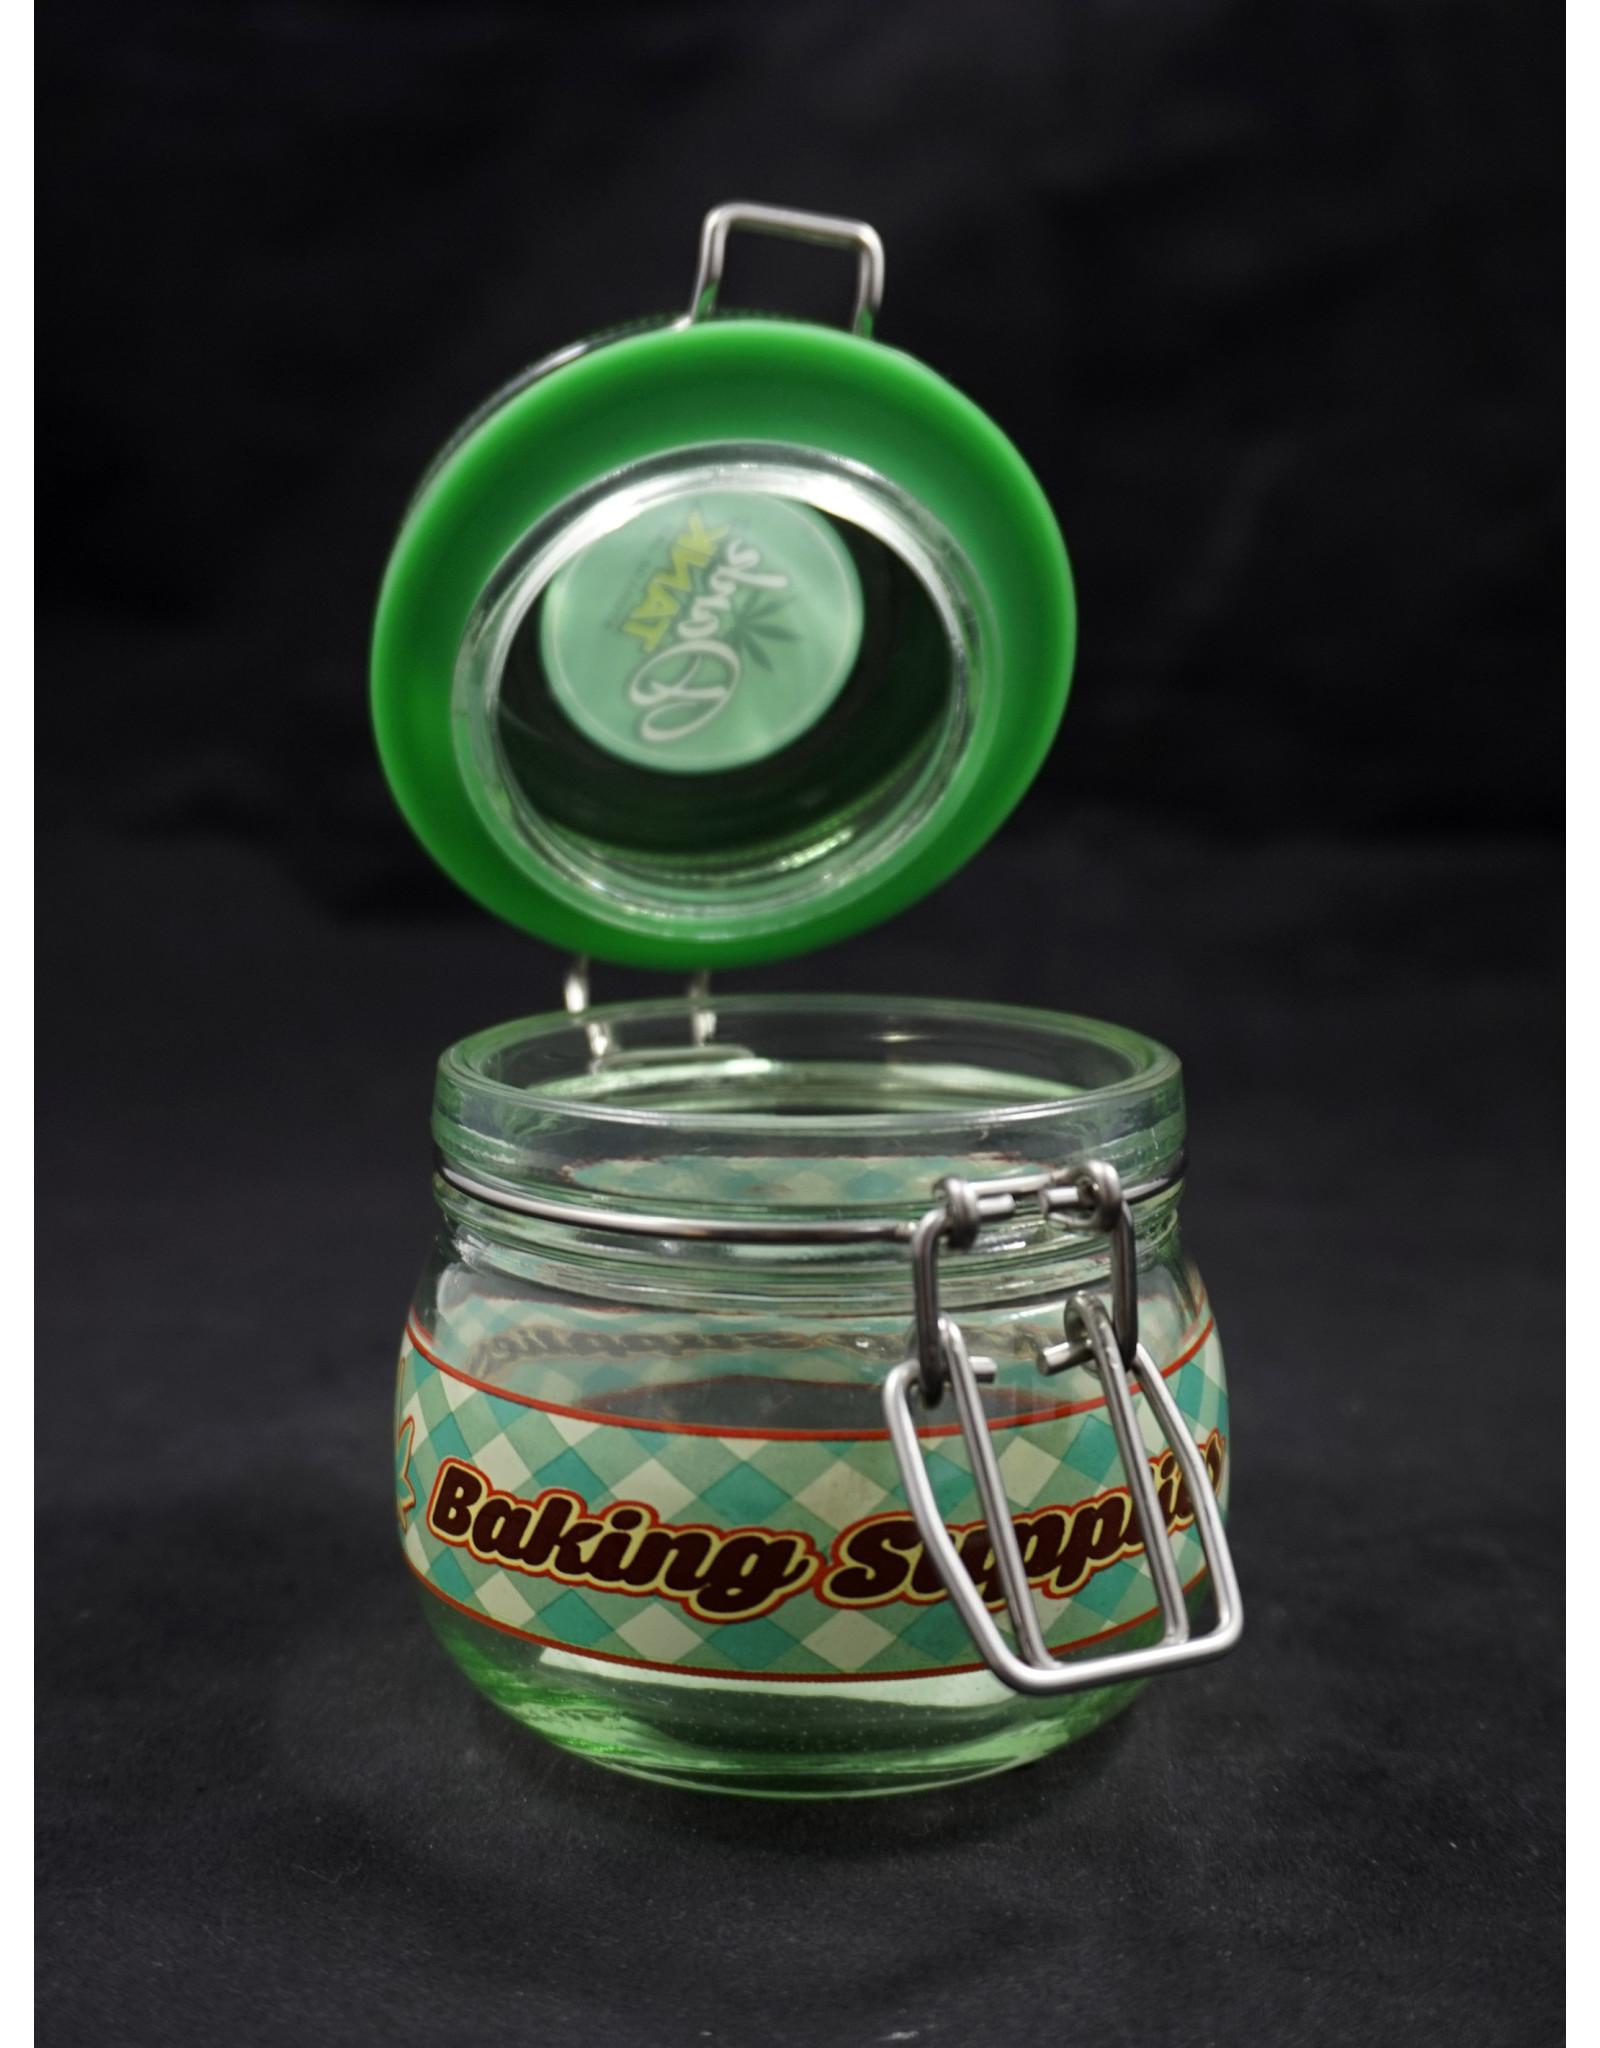 Baking Supplies Glass Jar - Small